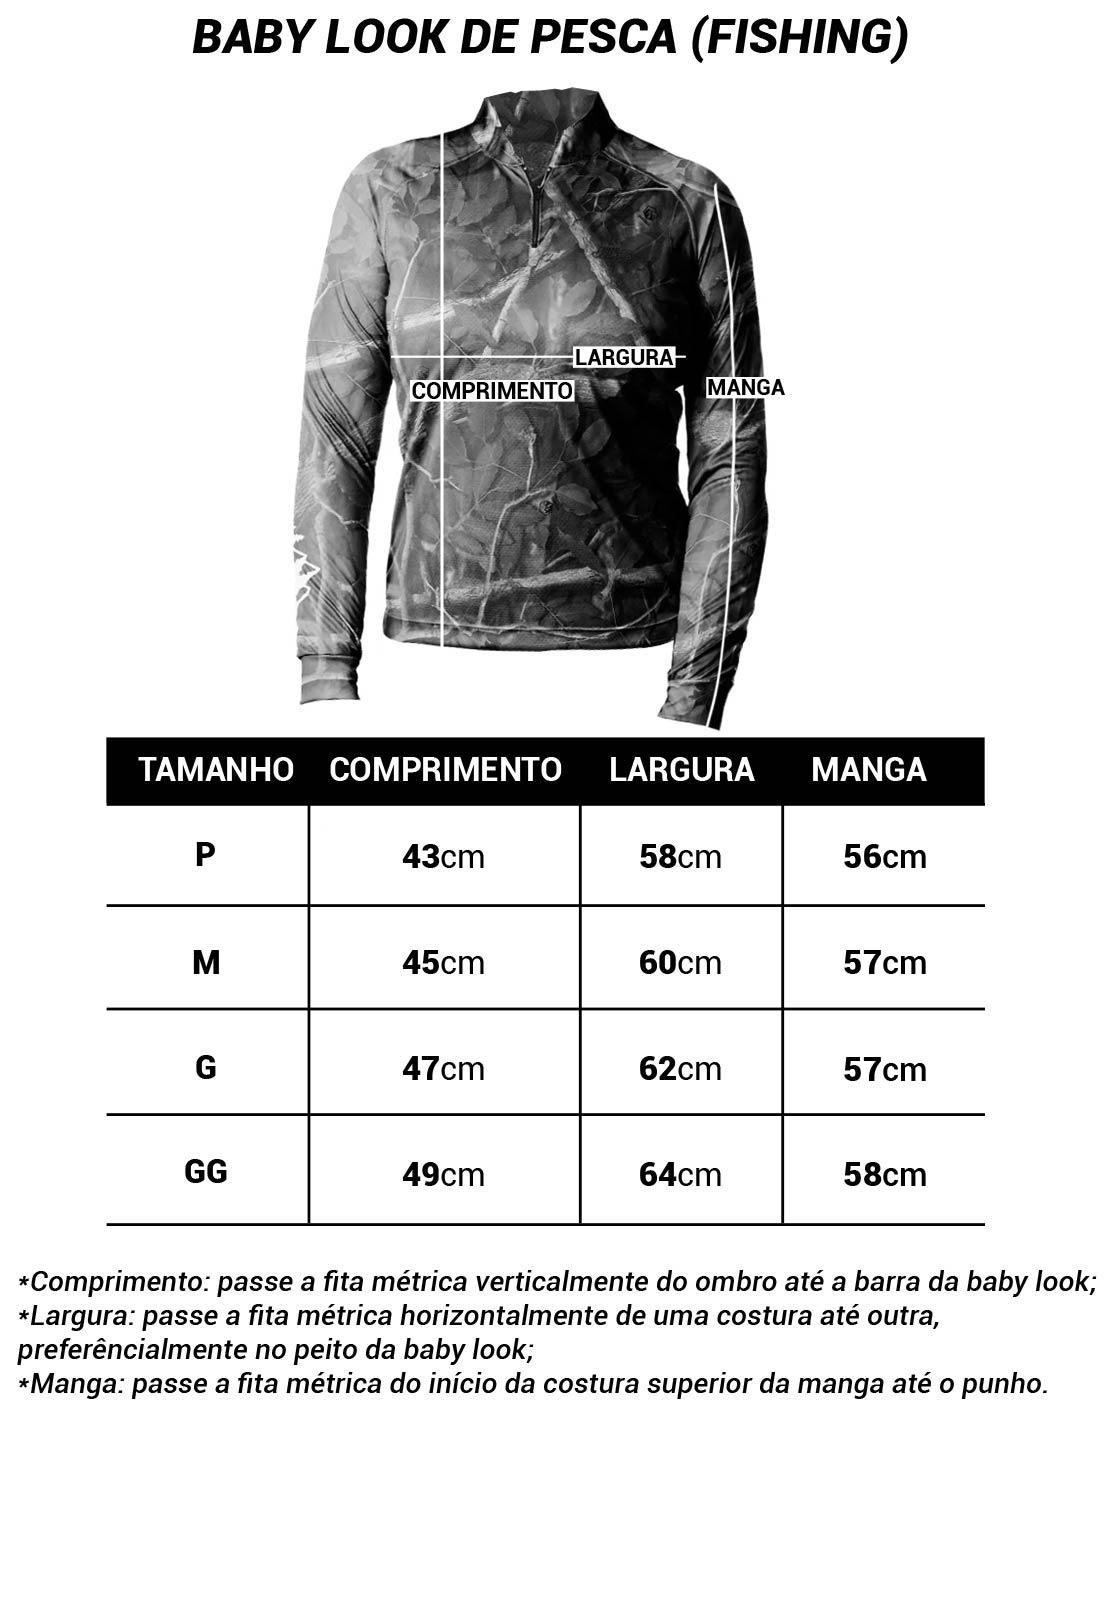 CAMISA DE PESCA FISH TECH PRO 26 FEMININA + BANDANA GRÁTIS  - Real Hunter